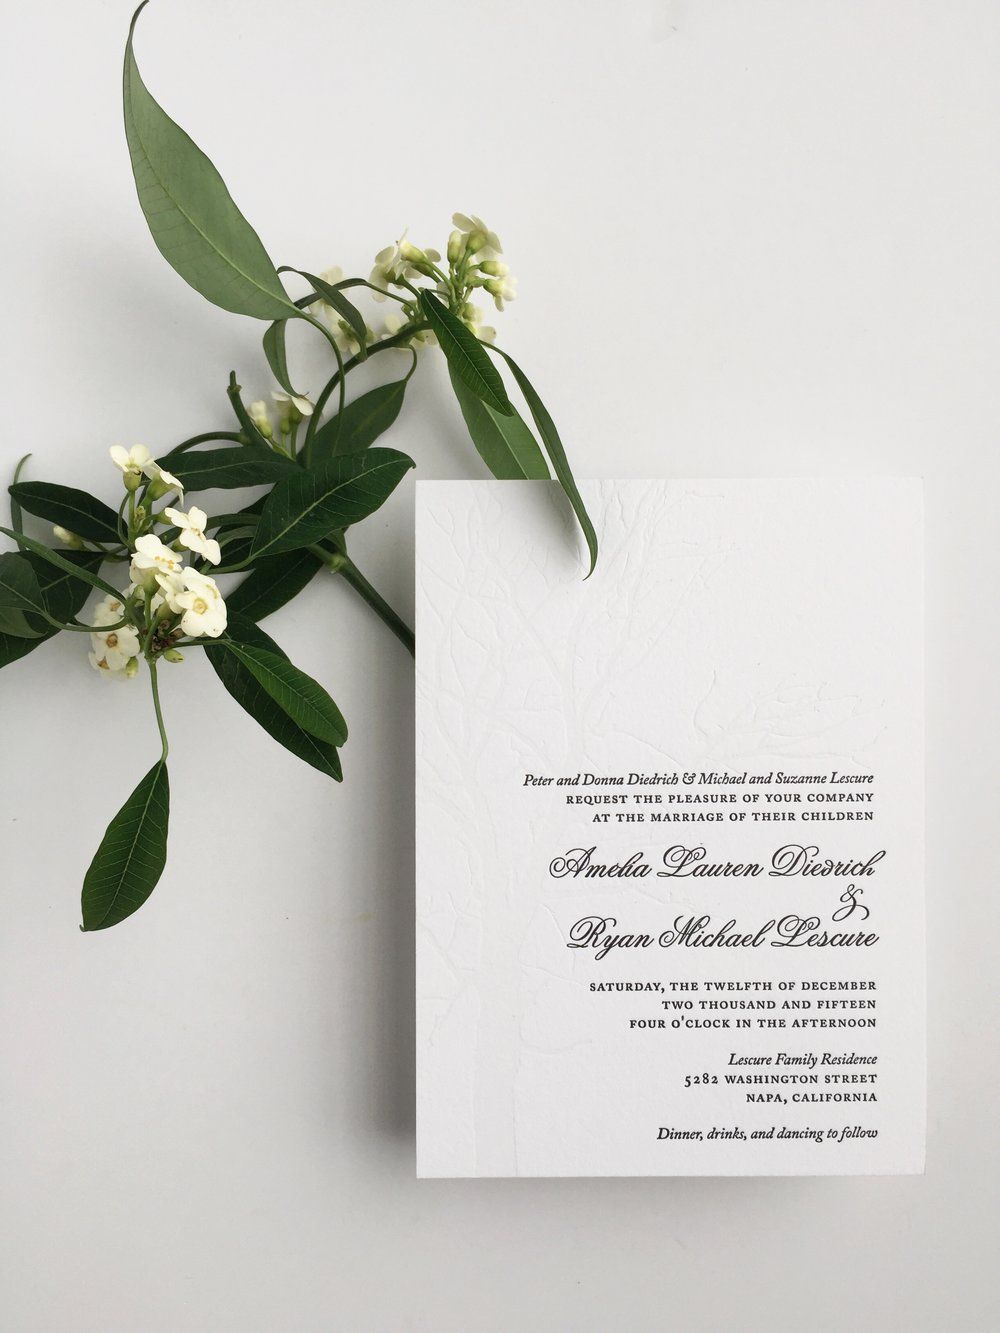 Letterpressed Blind Debosed Invitation by Bowerbird Atelier